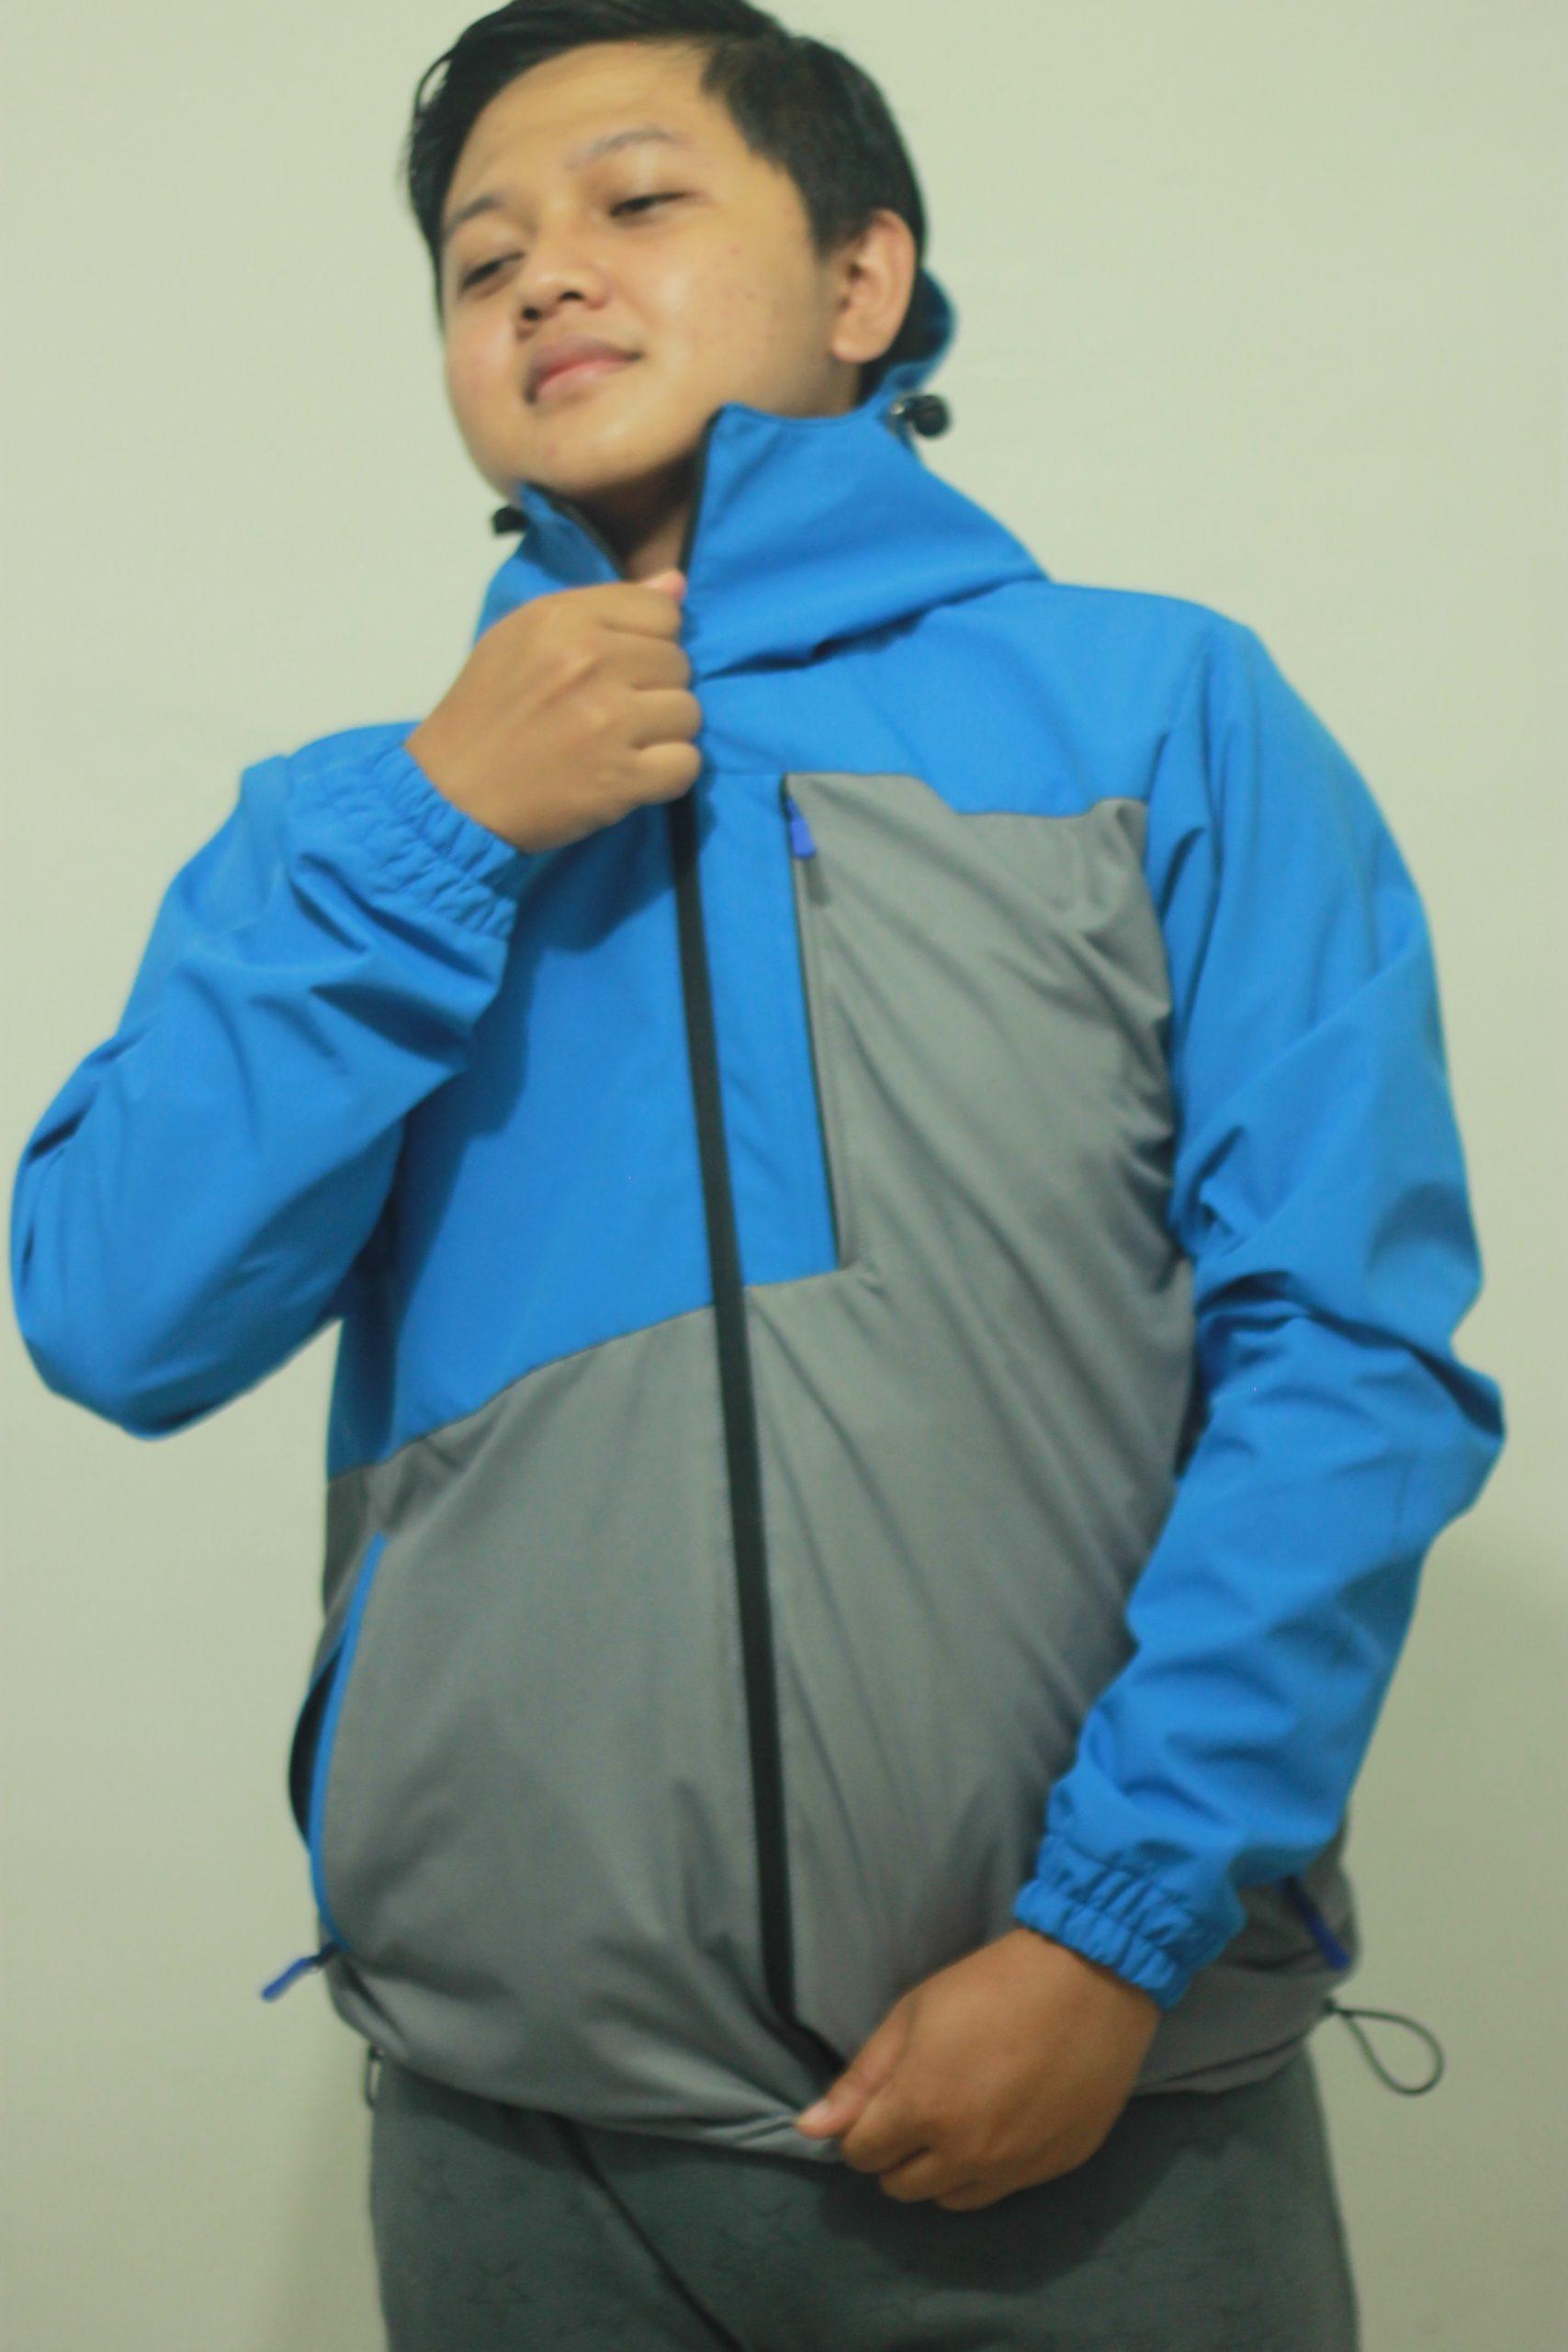 Jaket Gunung Biru Dongker yang fenomenal